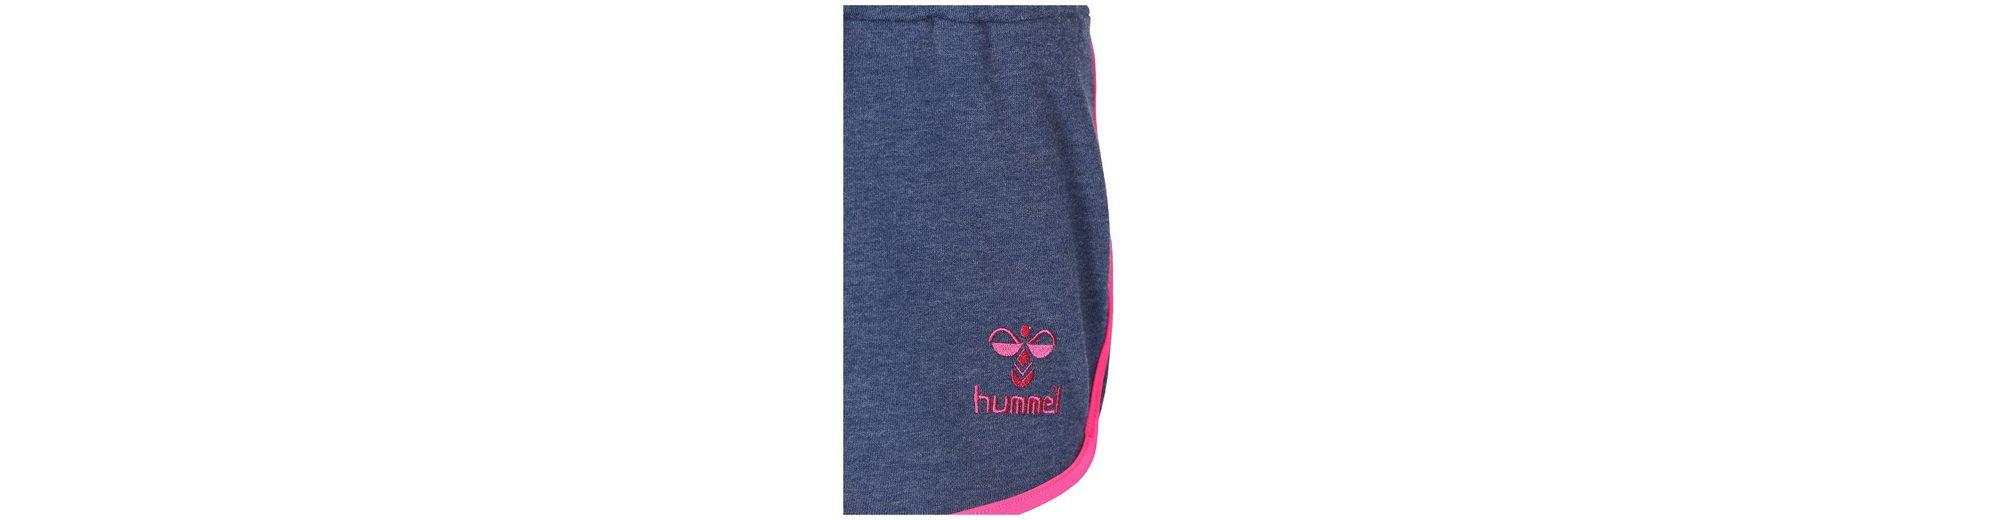 Hummel Shorts Classic Bee Bailey Verkauf Sehr Billig Auslass Sehr Billig Günstiger Preis Top-Qualität 3dI4LknnpP